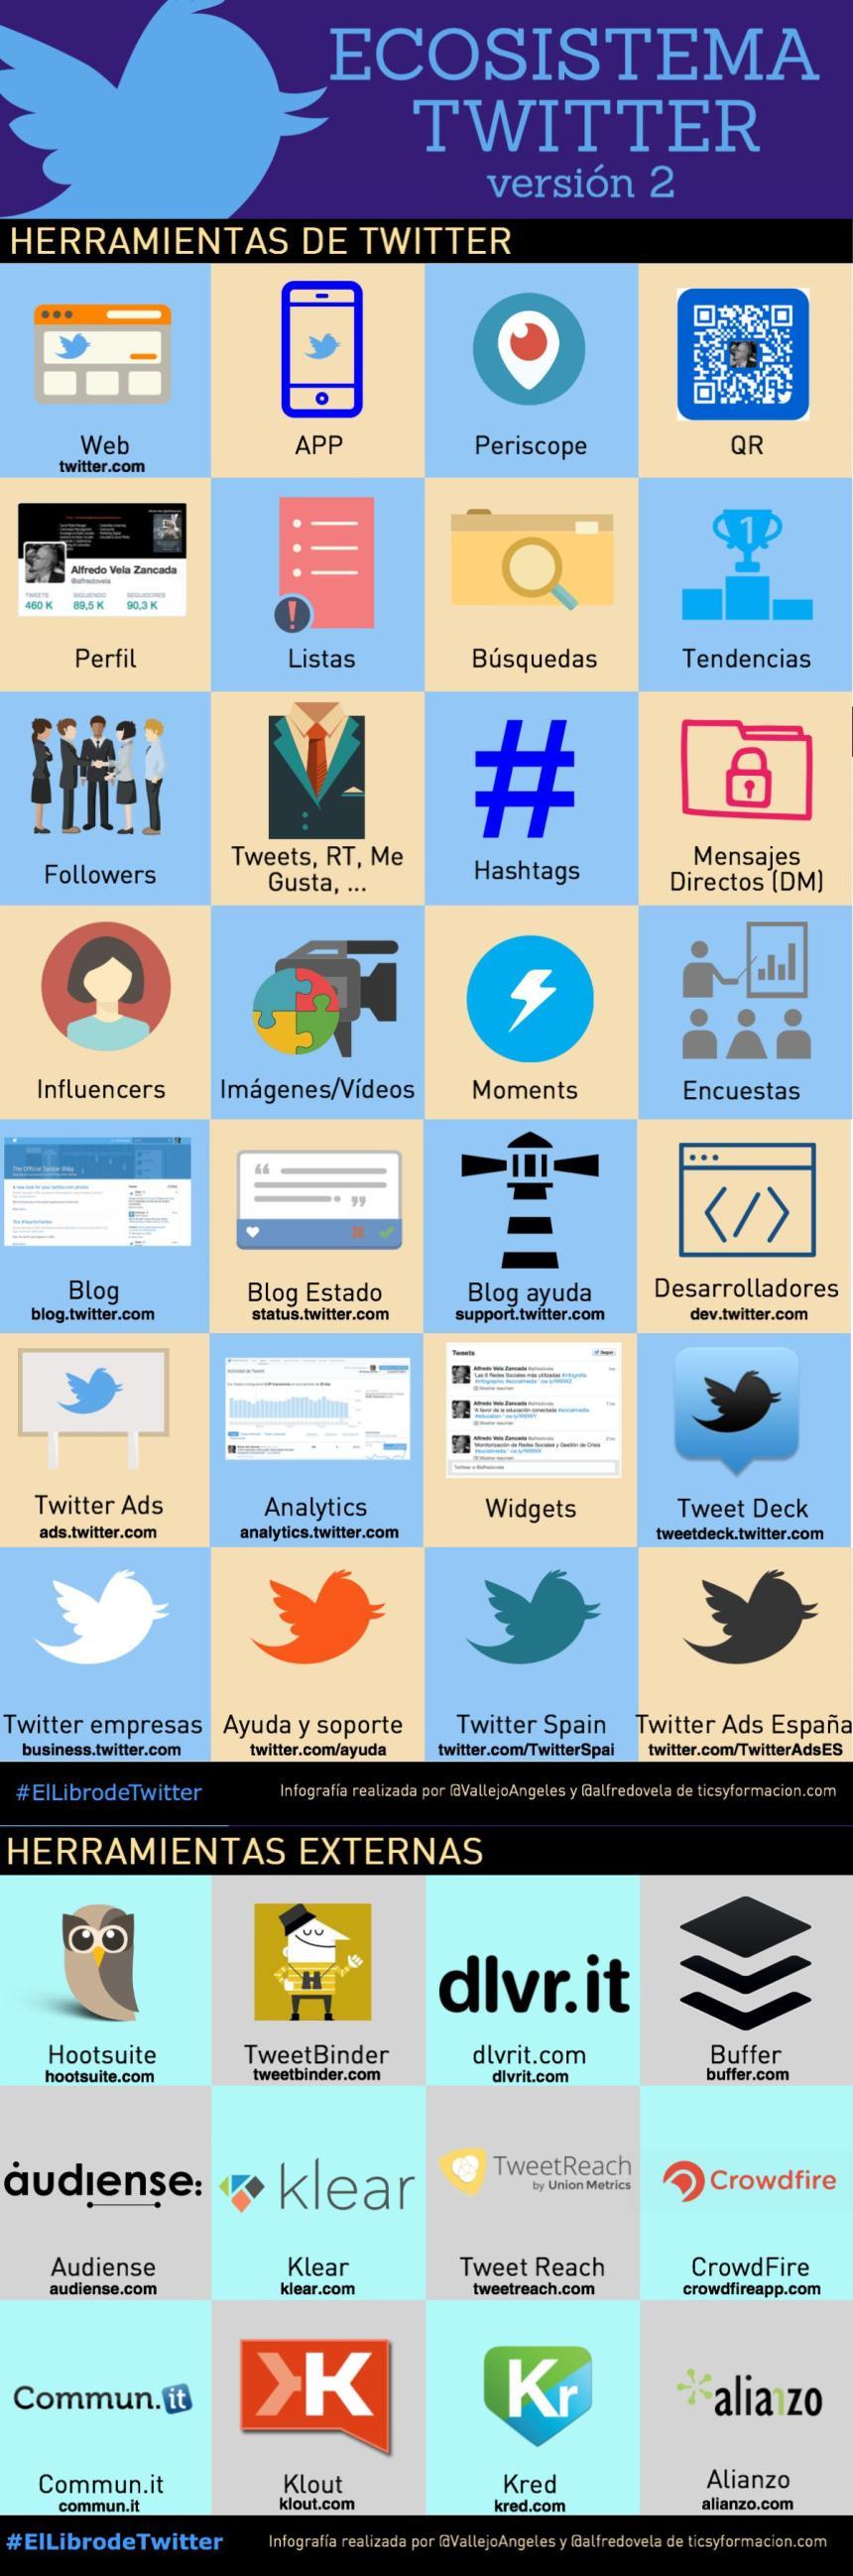 Ecosistema Twitter (versión 2)